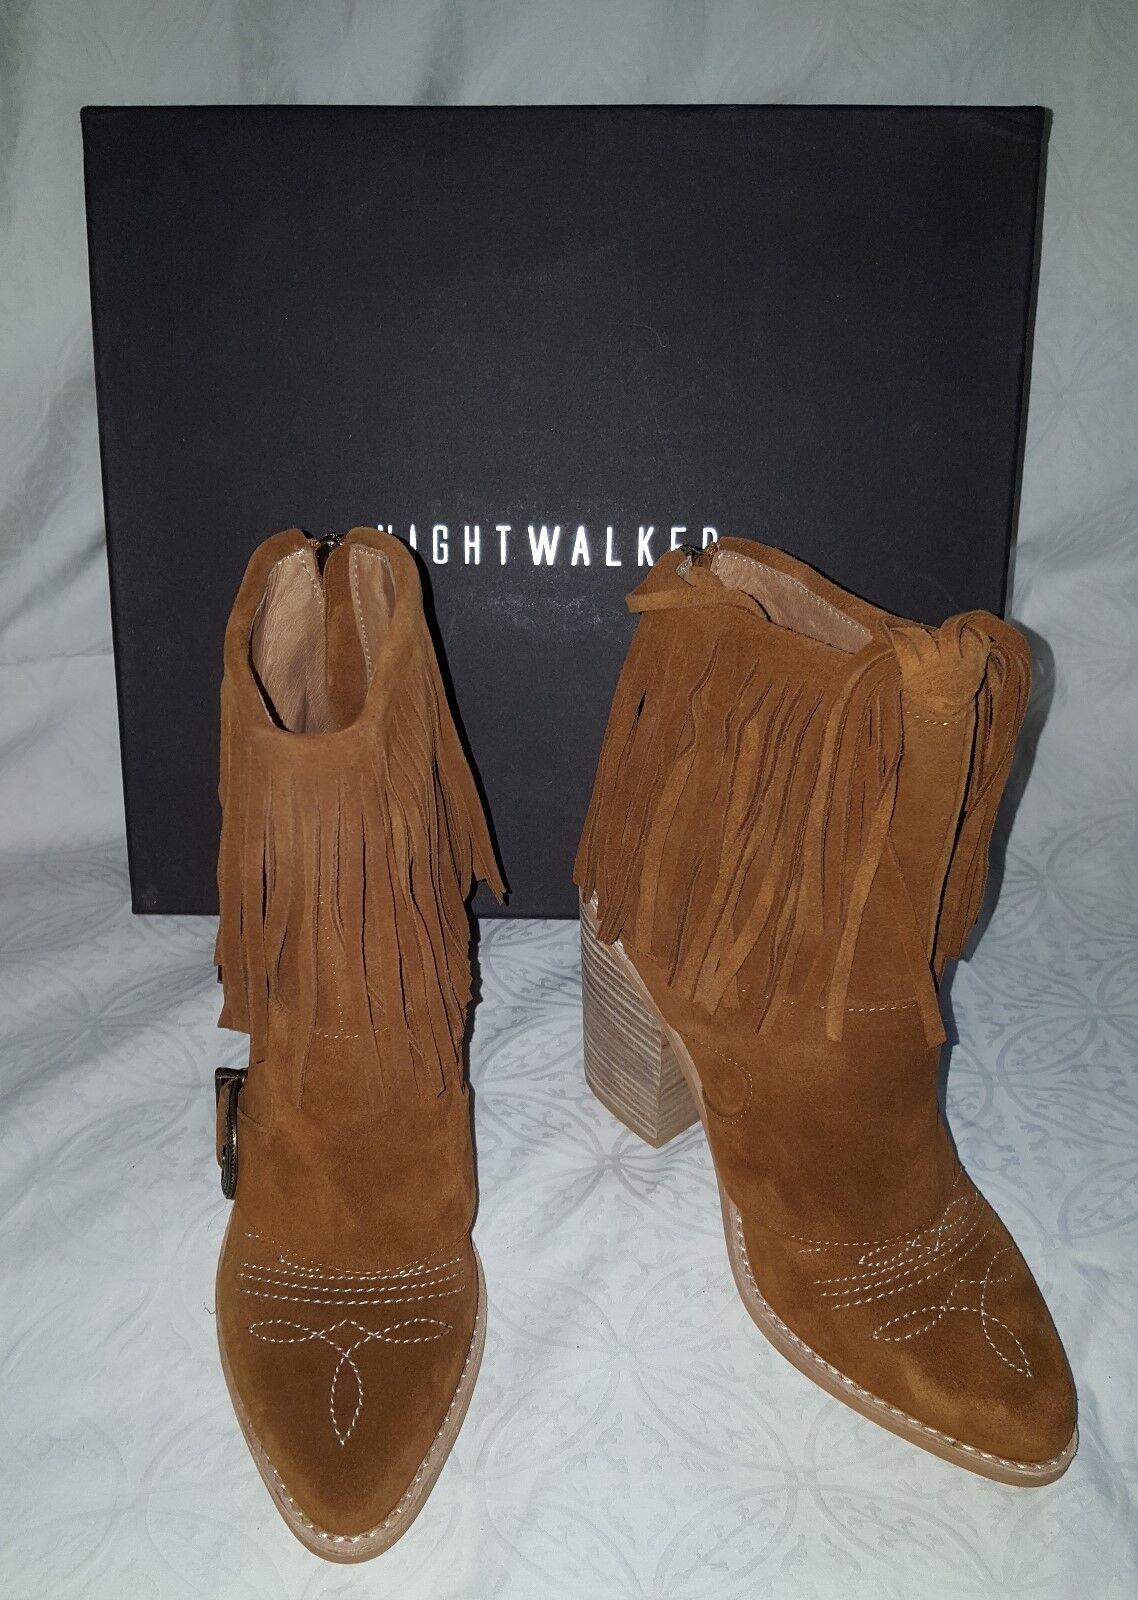 New Nightwalker Boots Brown Suede Fringe Western 37 Cowboy Ankle Bootie